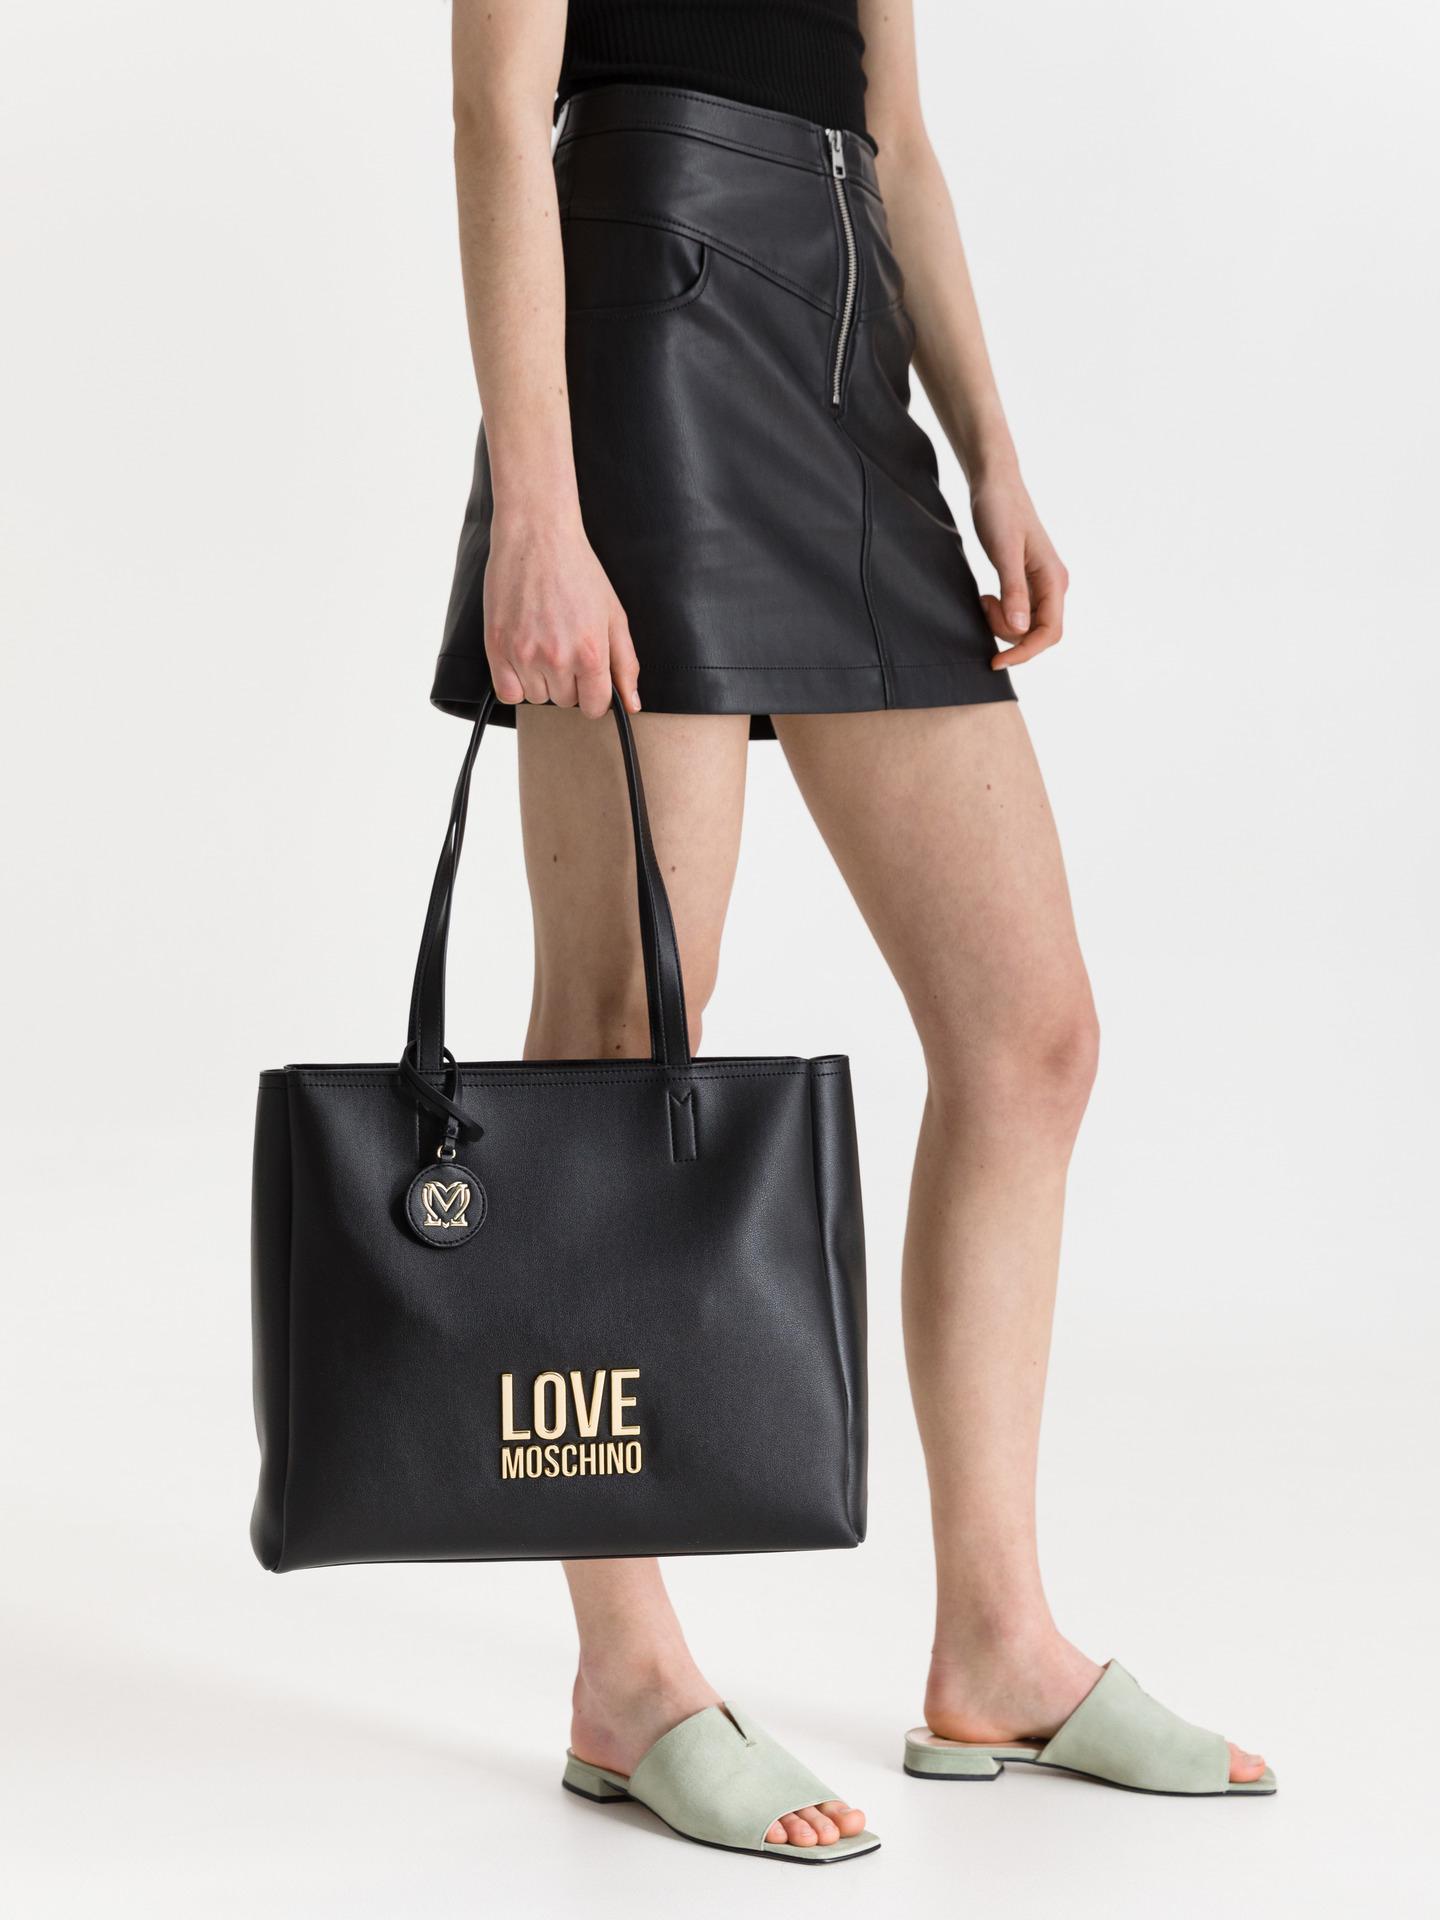 Love Moschino black handbag